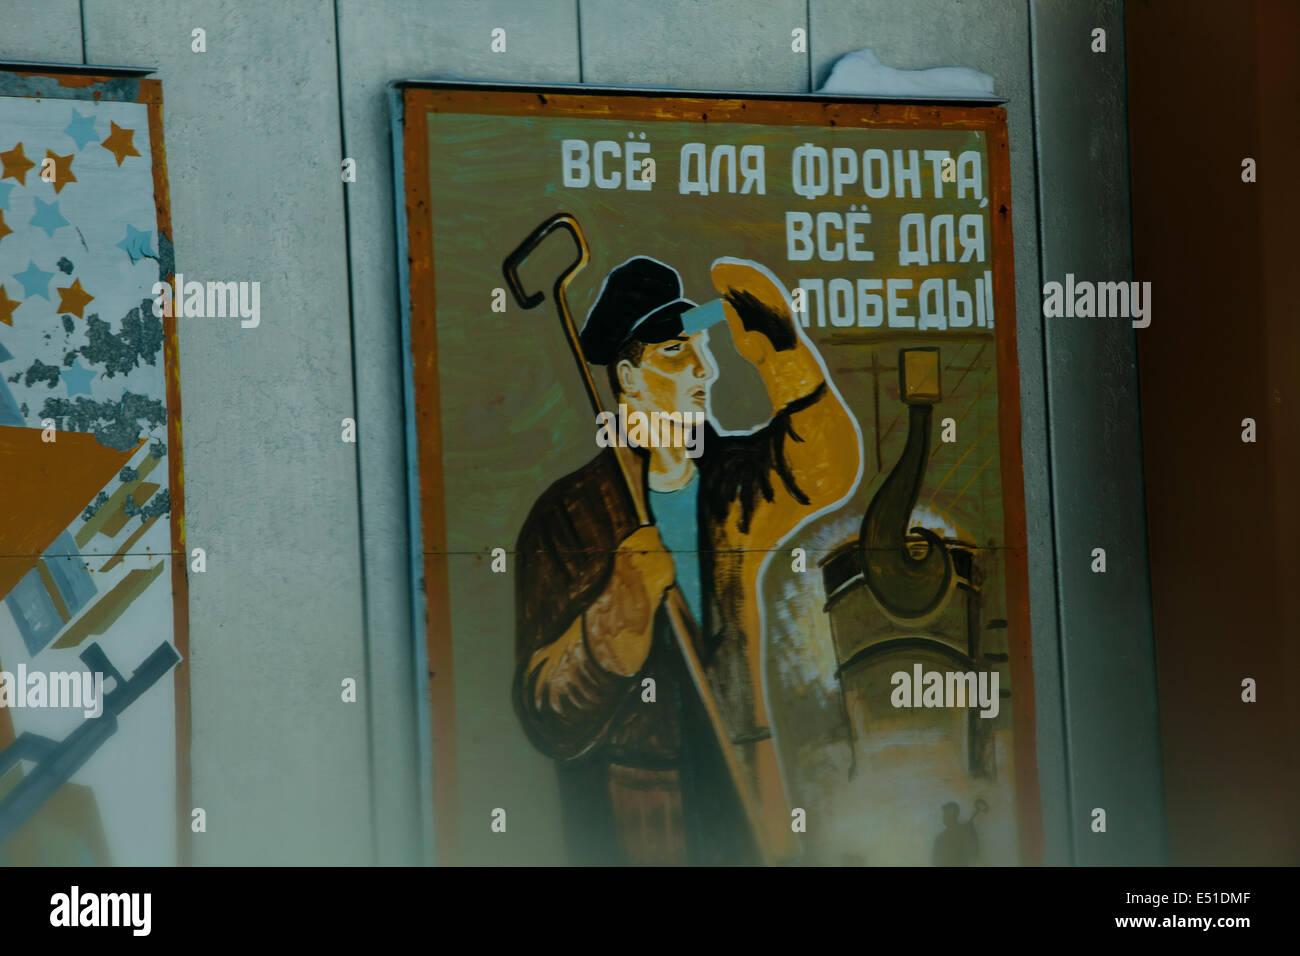 Russian war propaganda posters art street - Stock Image